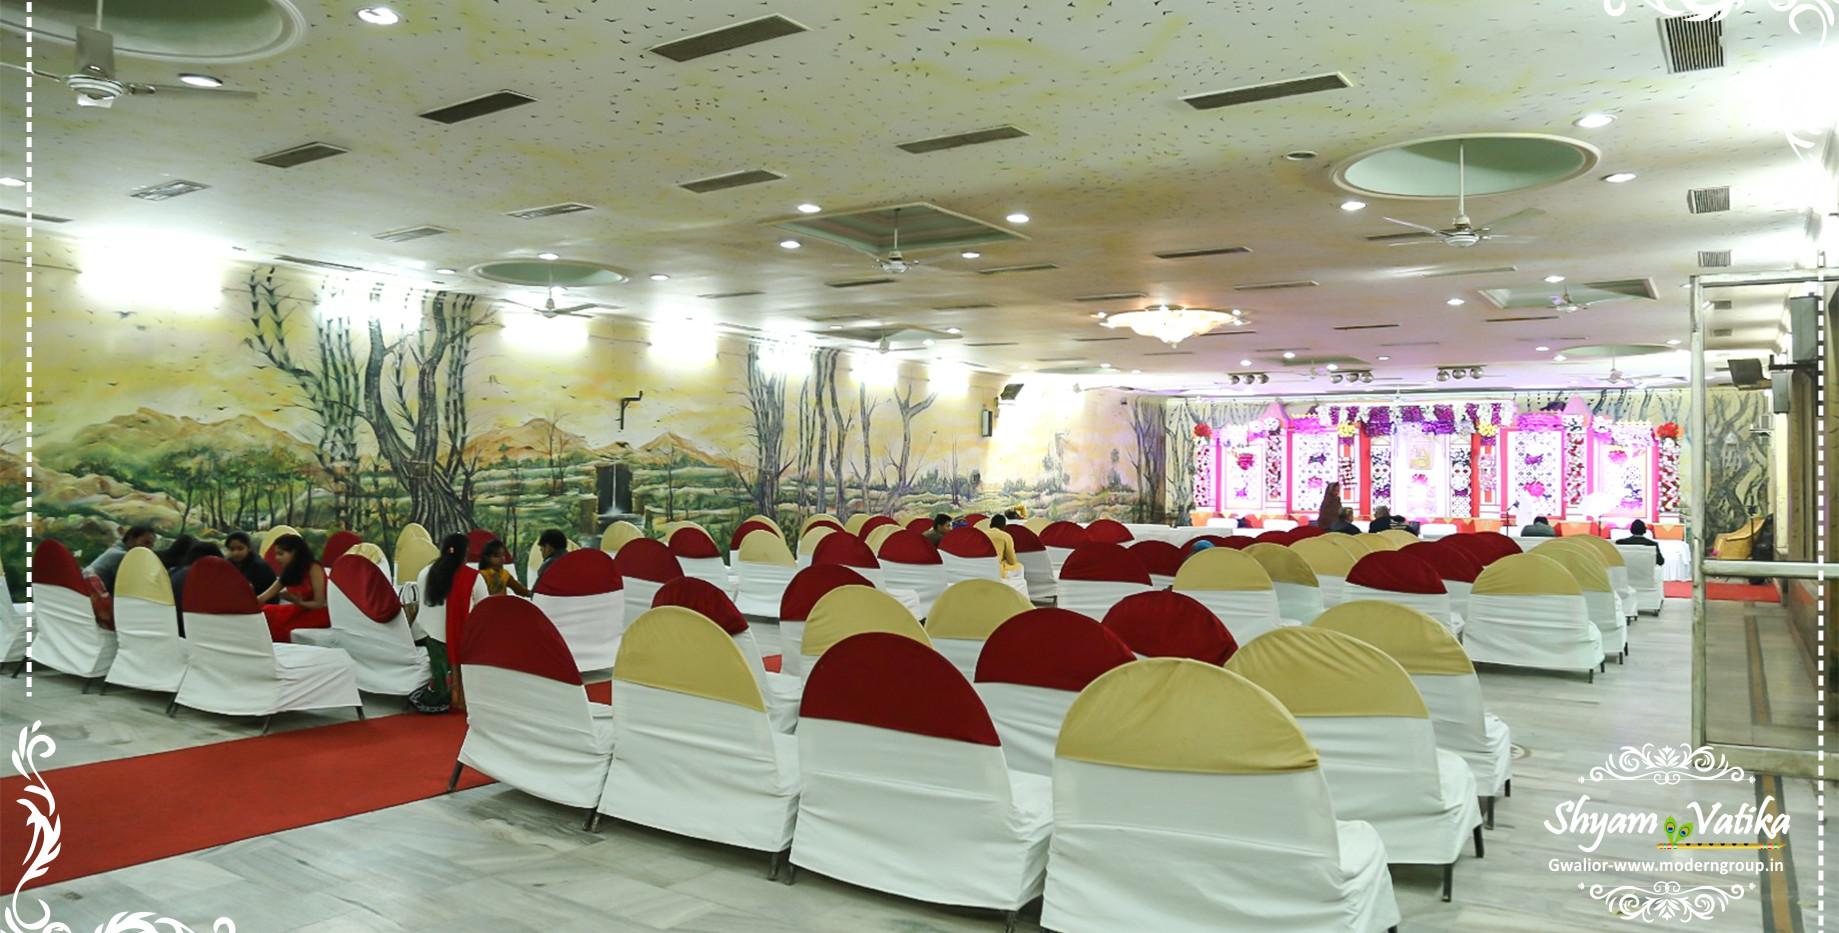 Shyam Vatika Gwalior 5.jpg